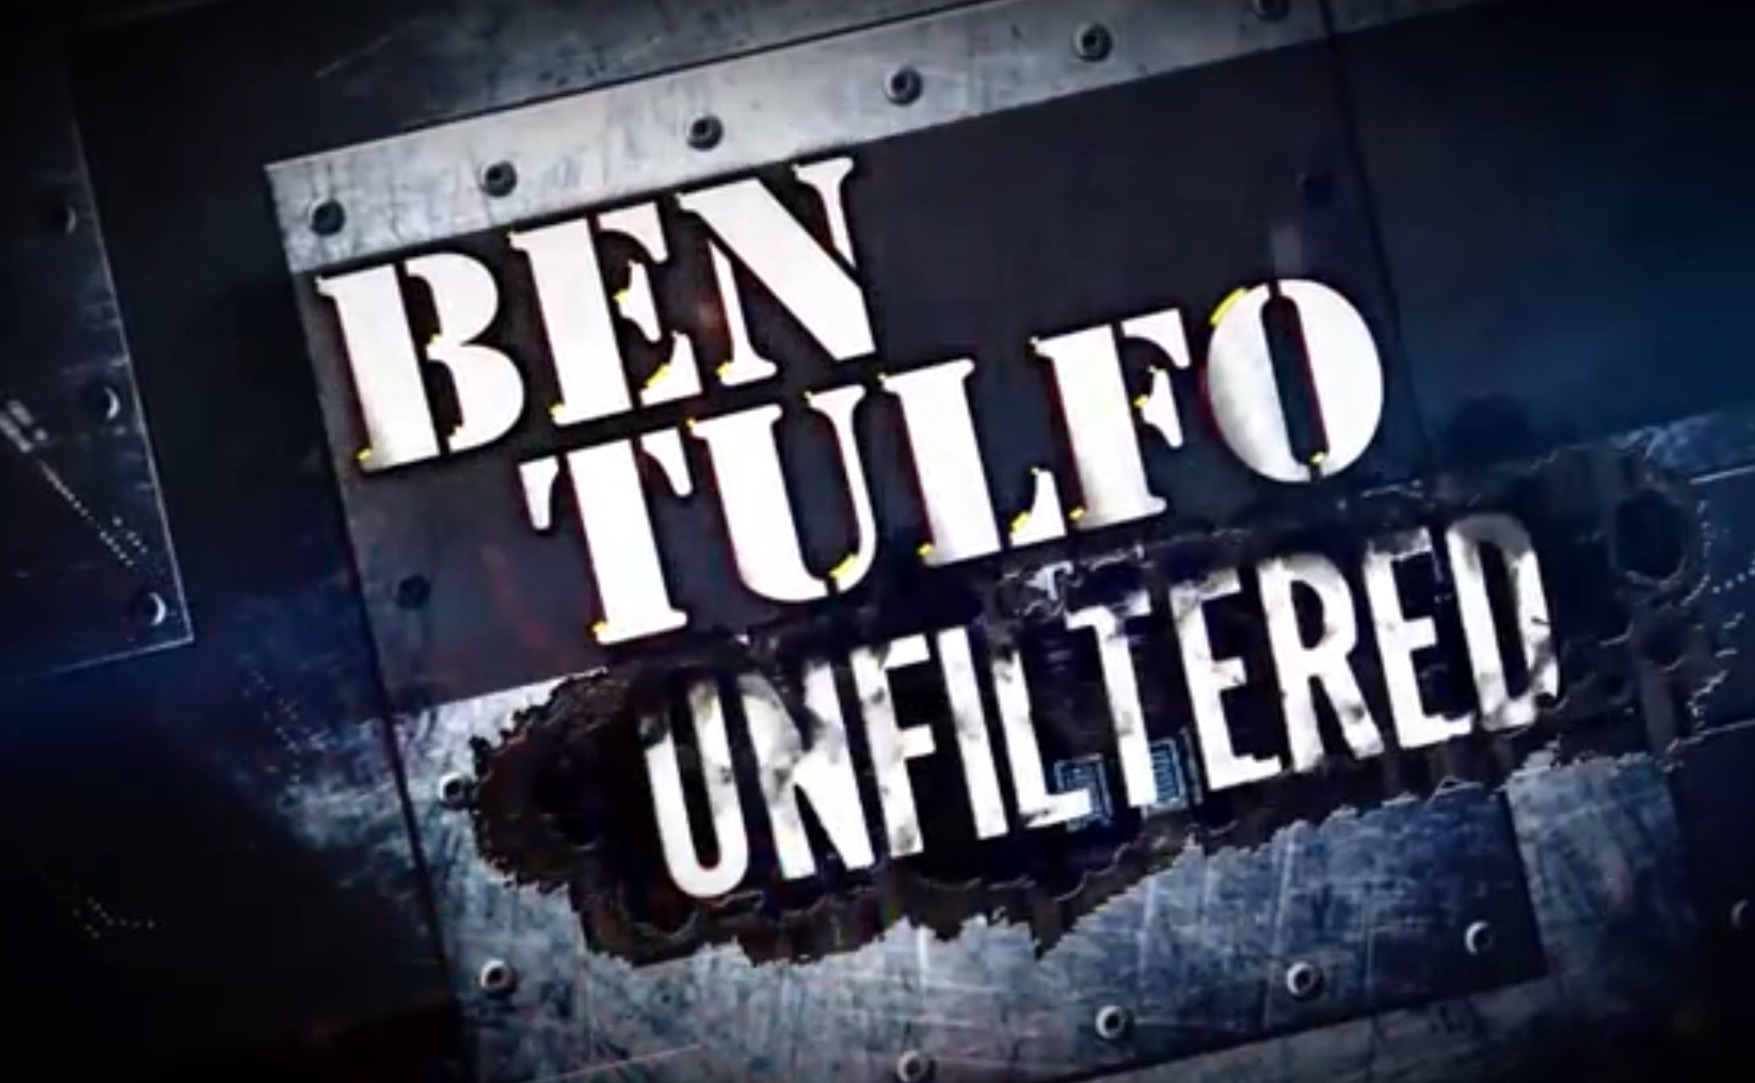 Ben Tulfo Unfiltered